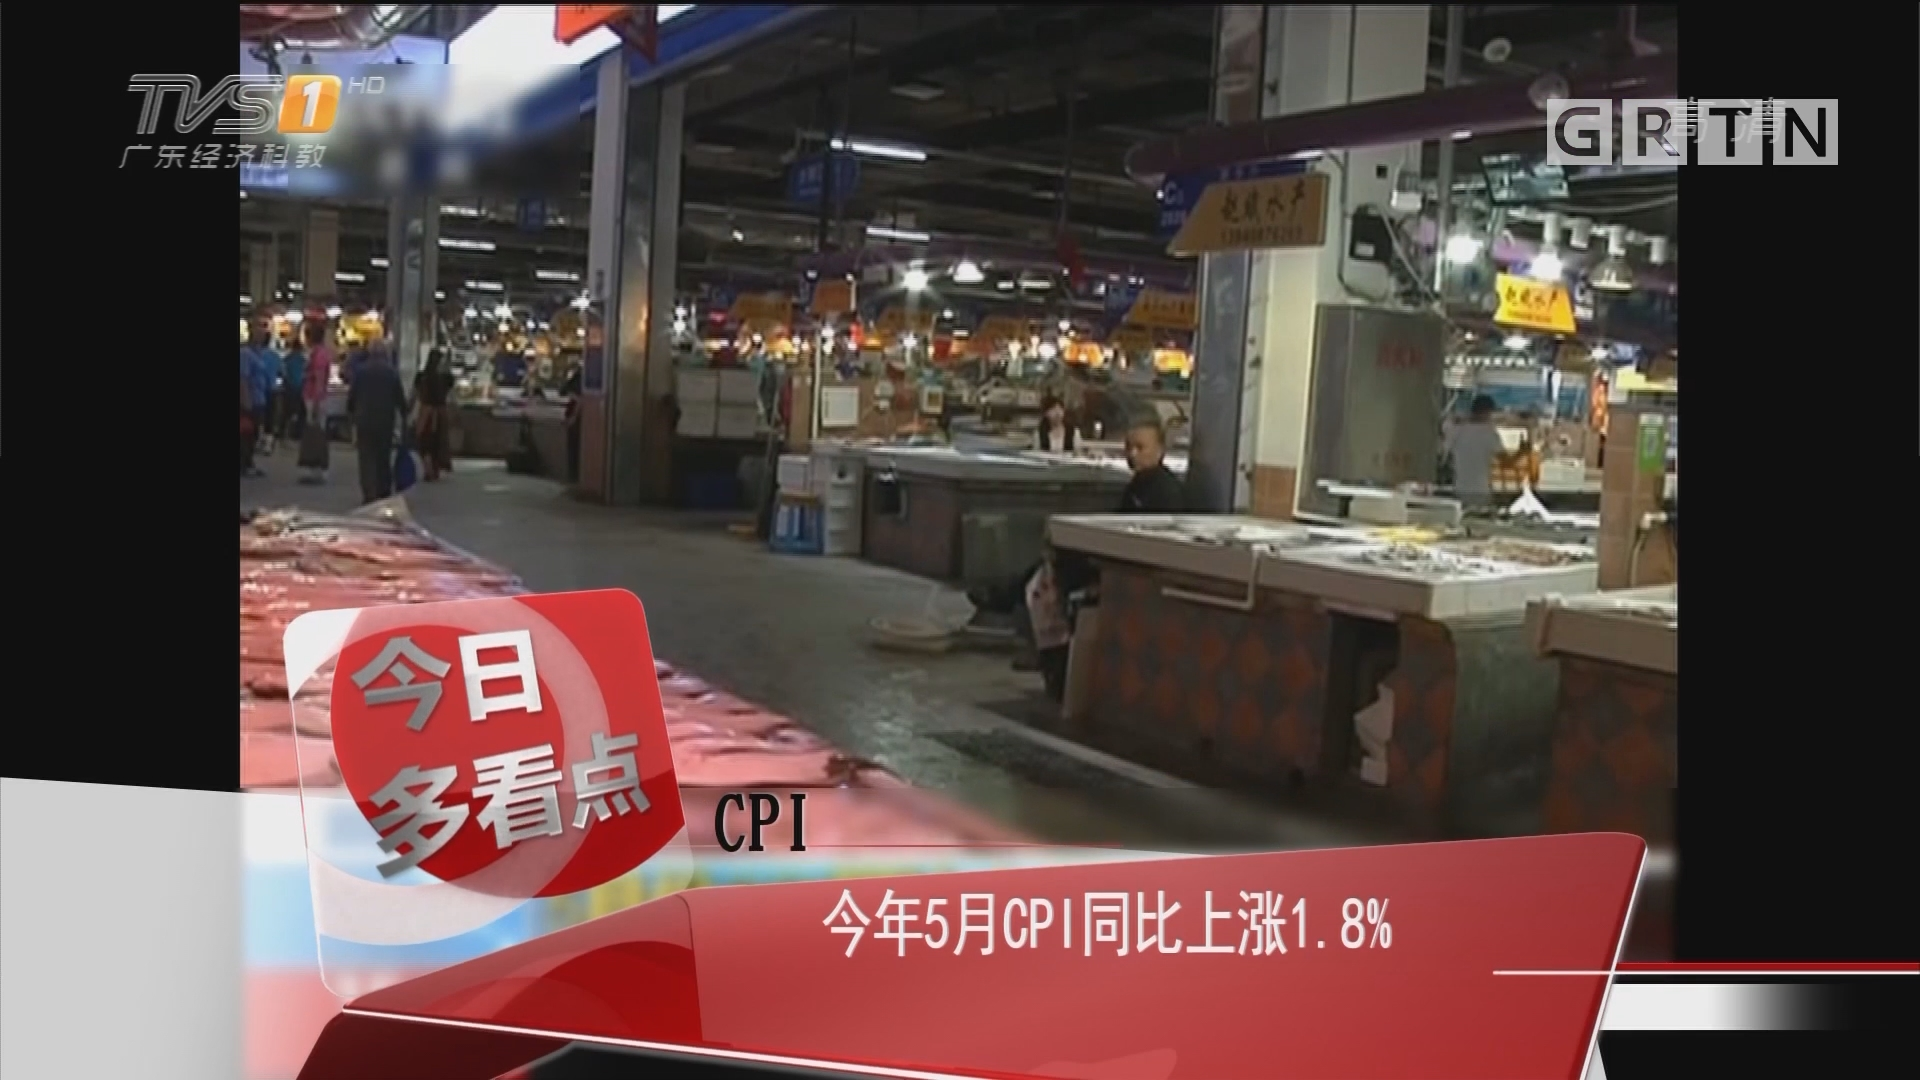 CPI:今年5月CPI同比上涨1.8%